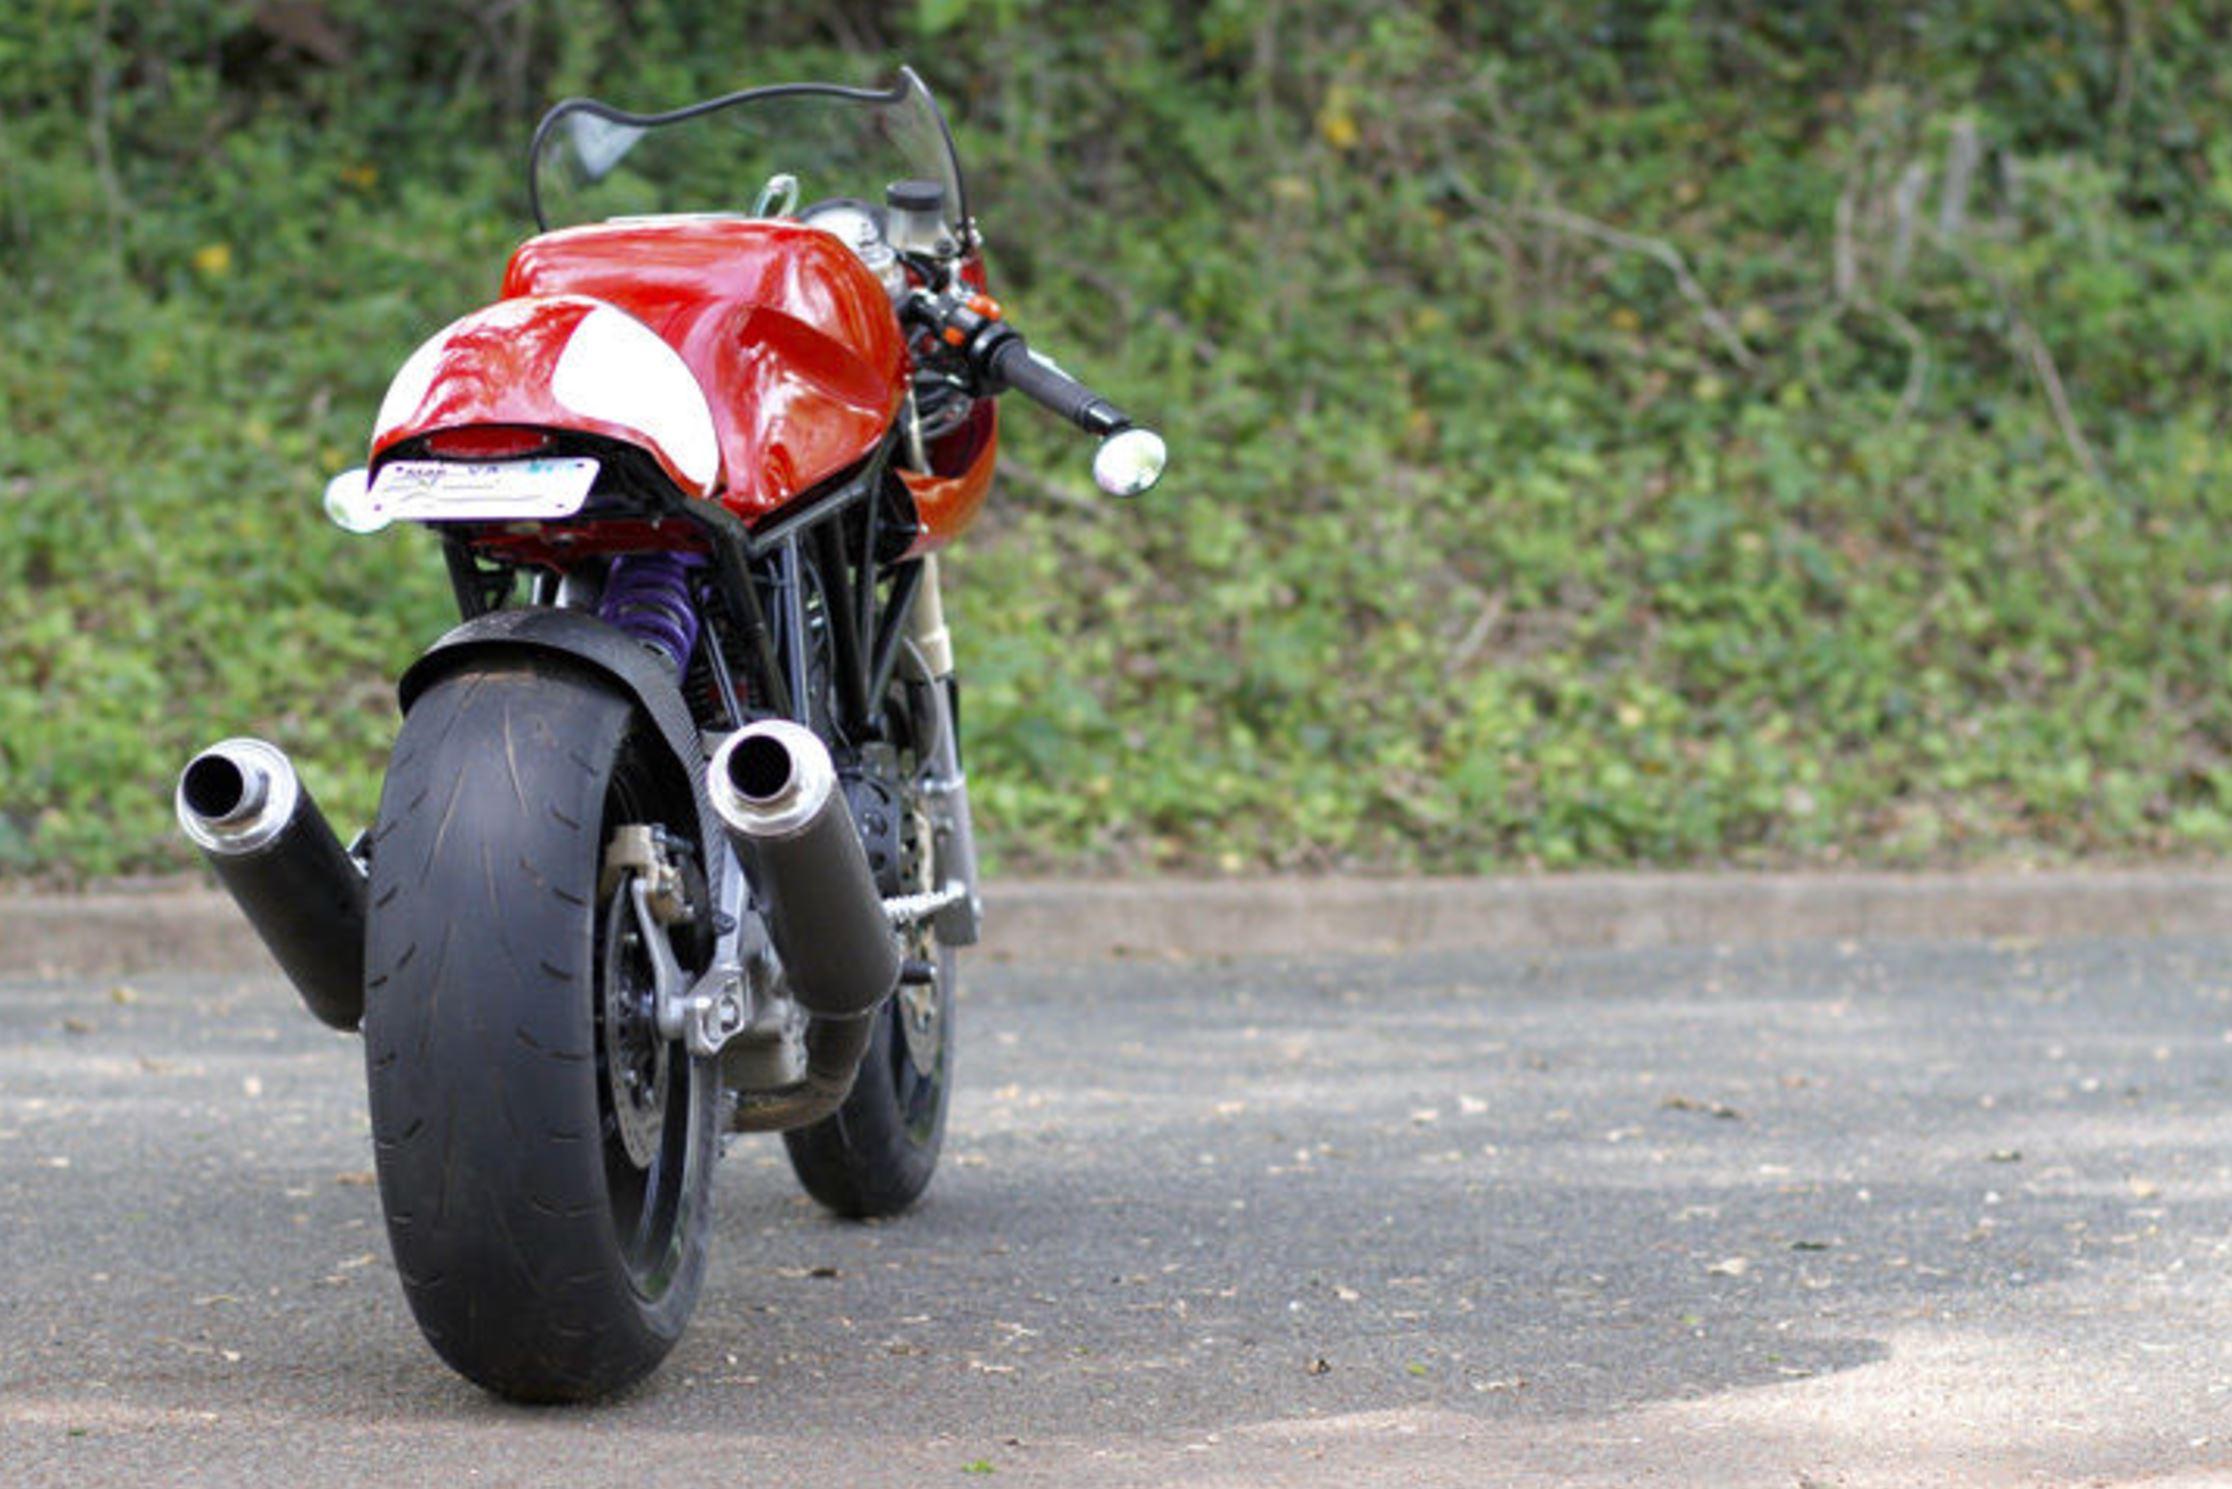 ending soon – 1993 ducati 900ss cafe racer | bike-urious